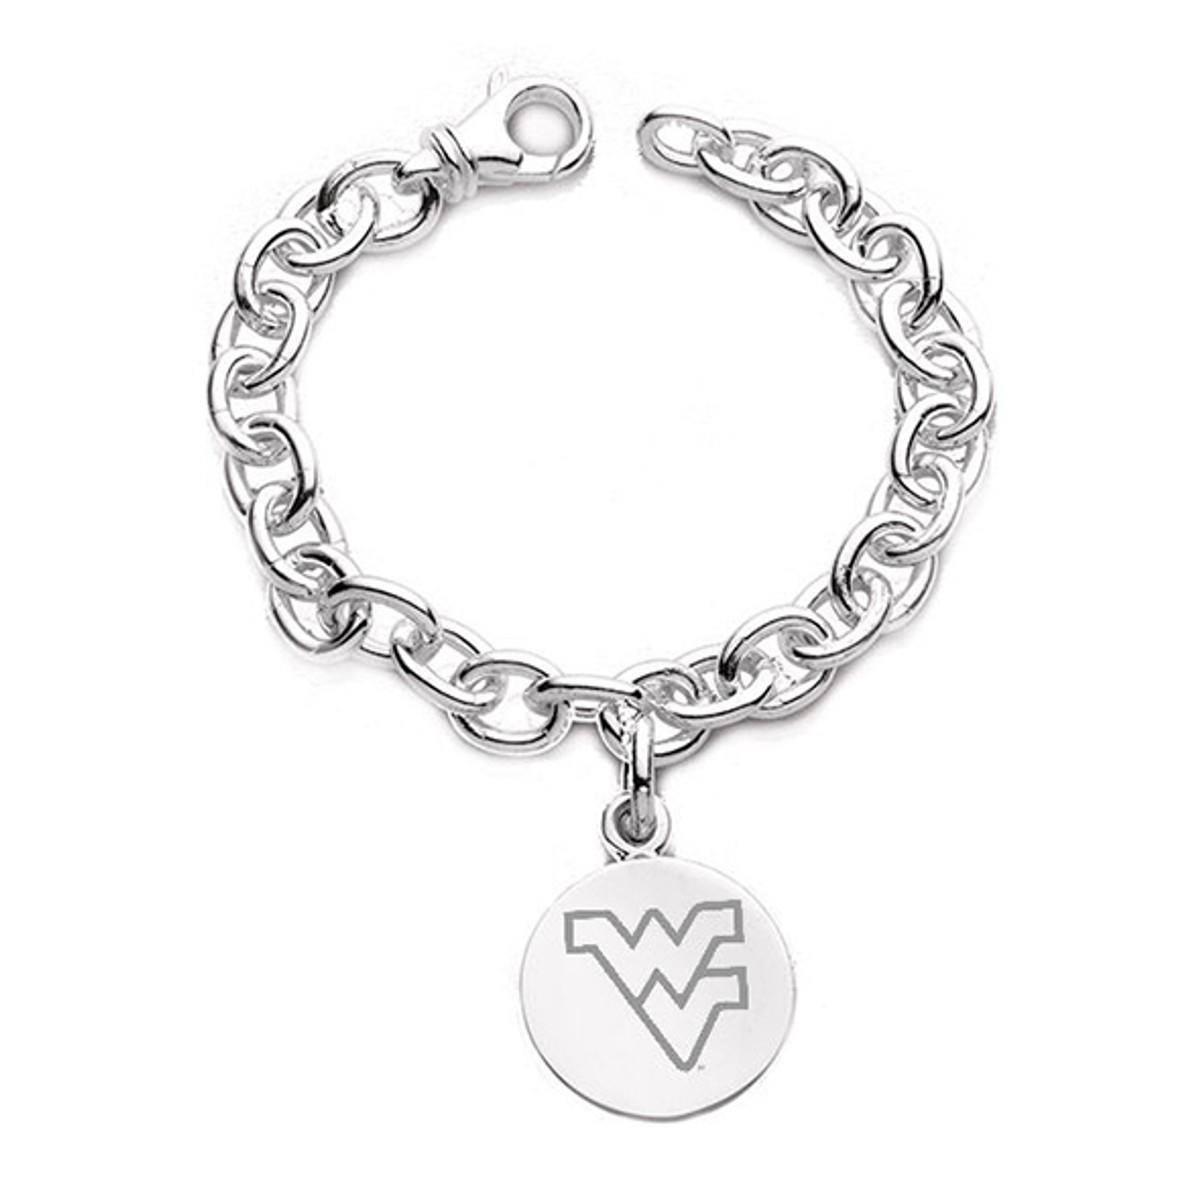 West Virginia University Sterling Silver Charm Bracelet at